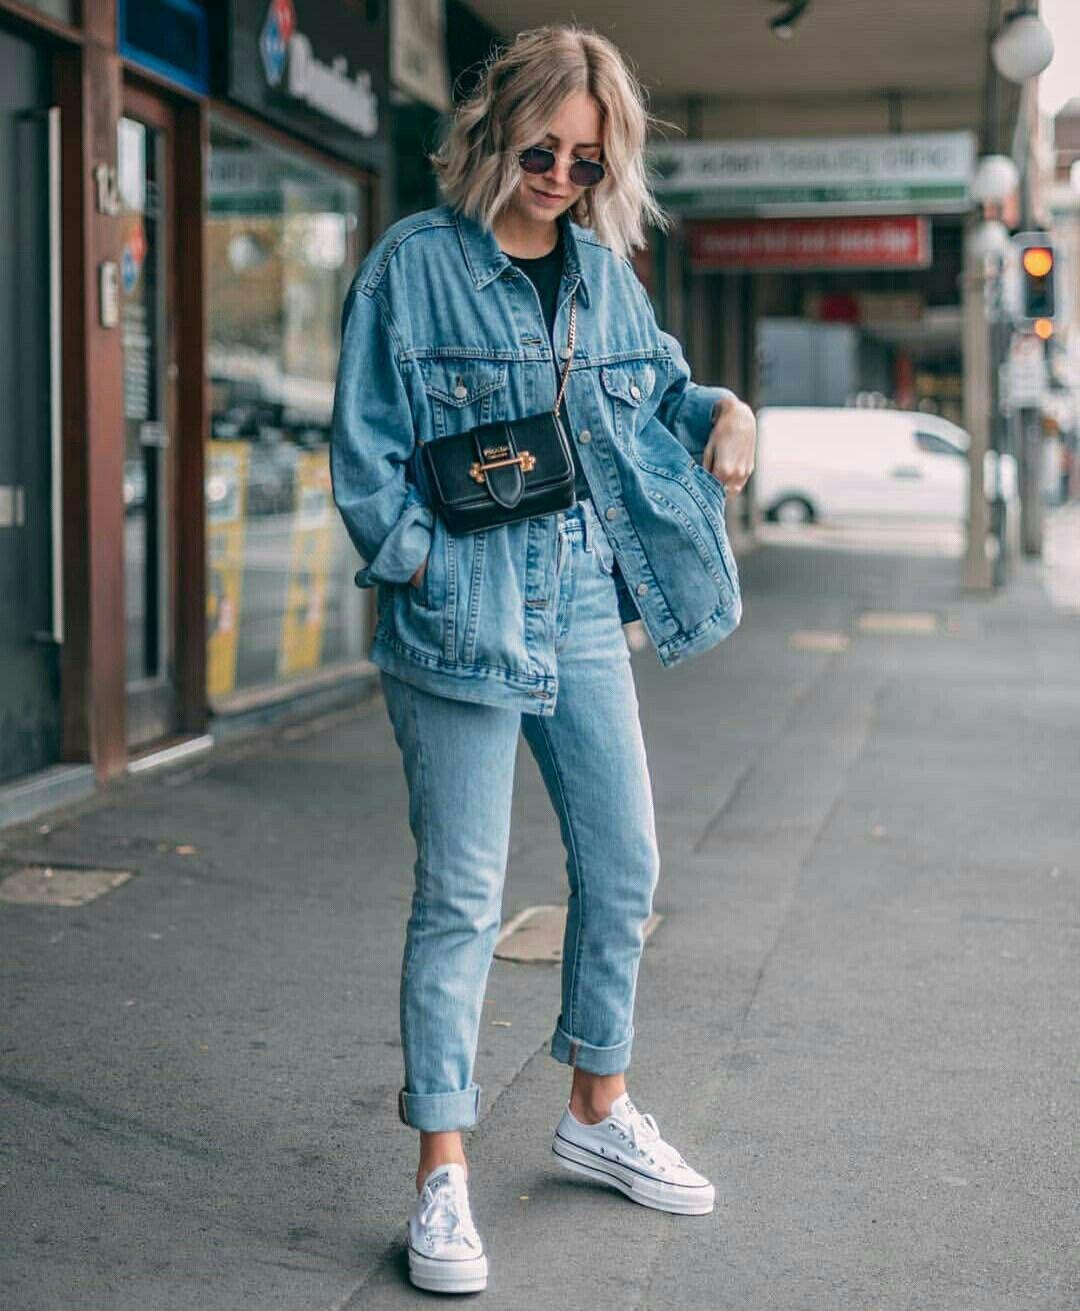 Oversized denim jacket outfit ideas